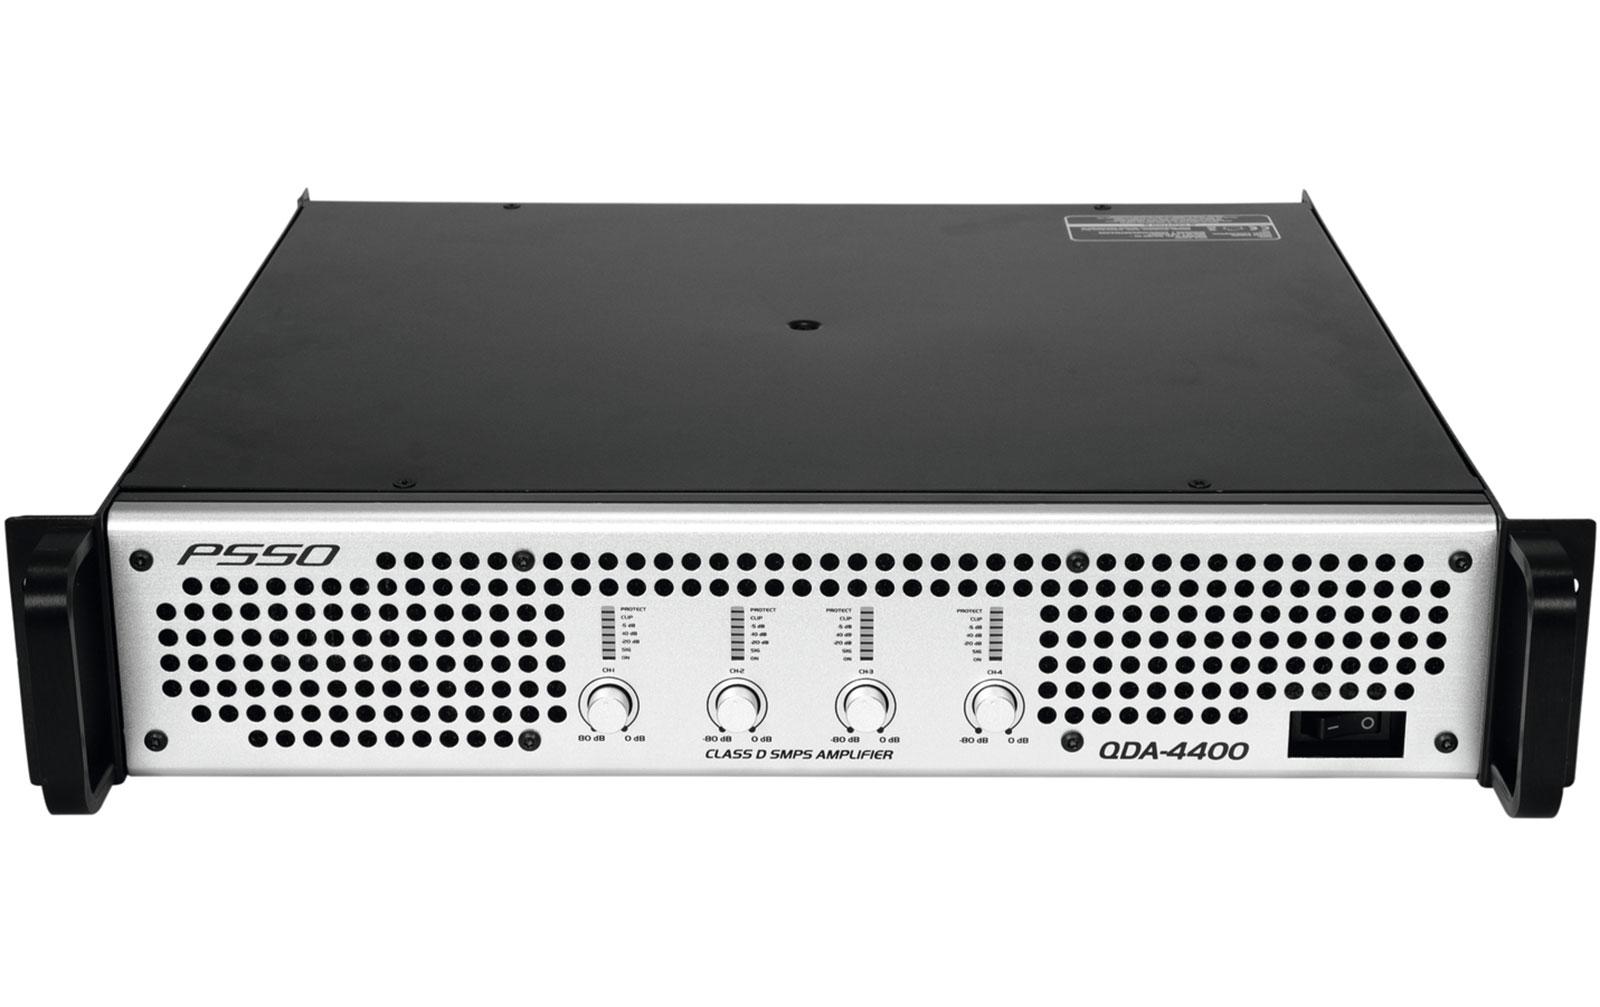 psso-qda-4400-4-kanal-endstufe